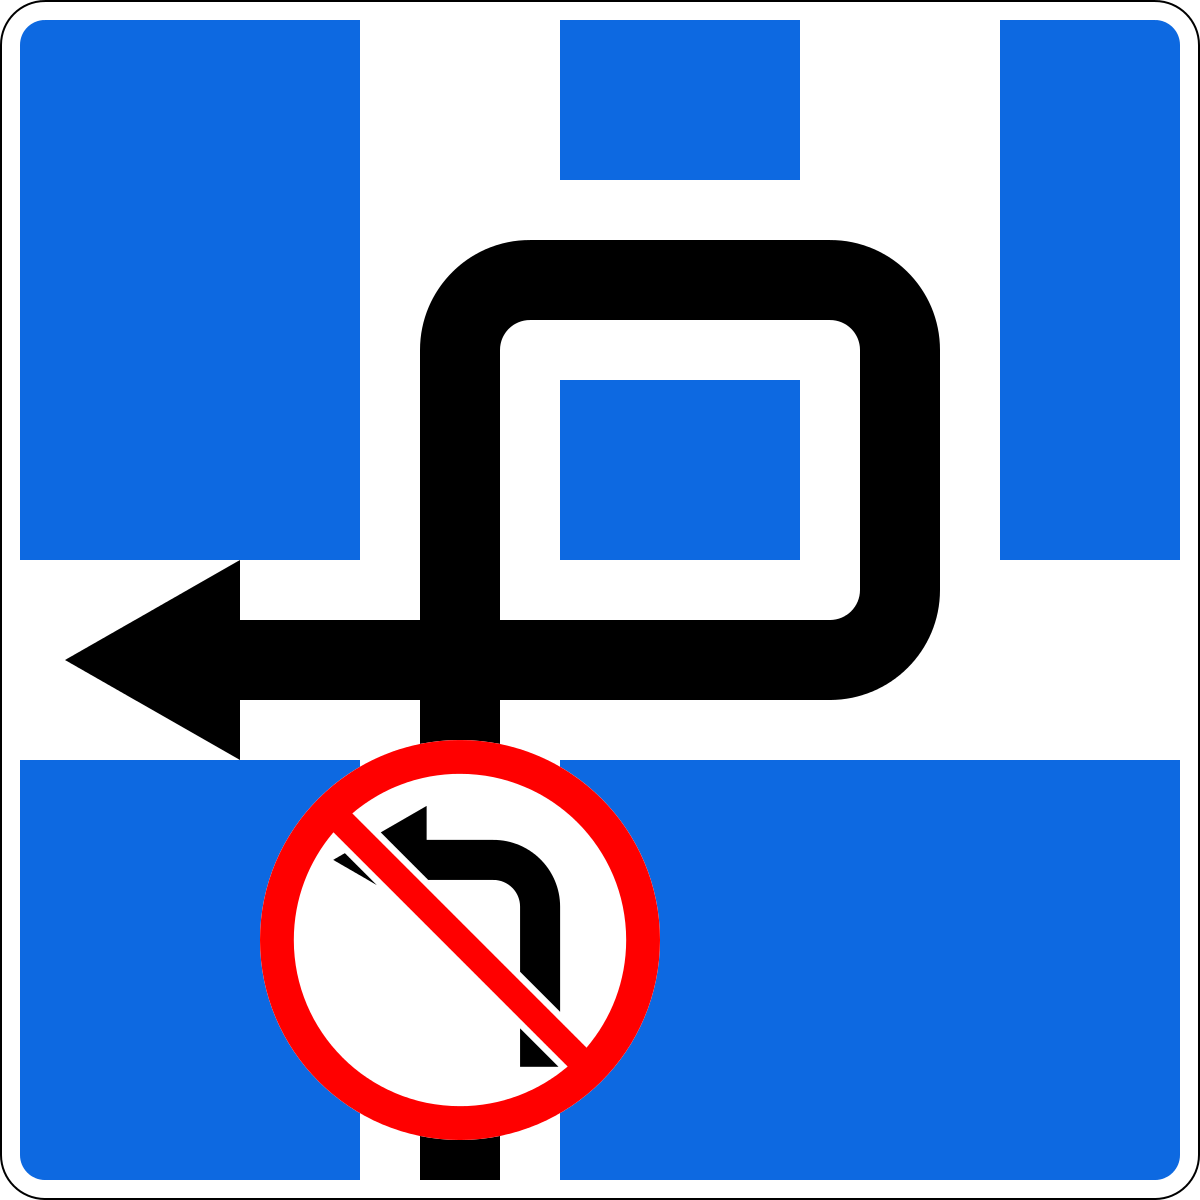 Знак 5.20.3 Қозғалыс сызбасы/ Схема движения